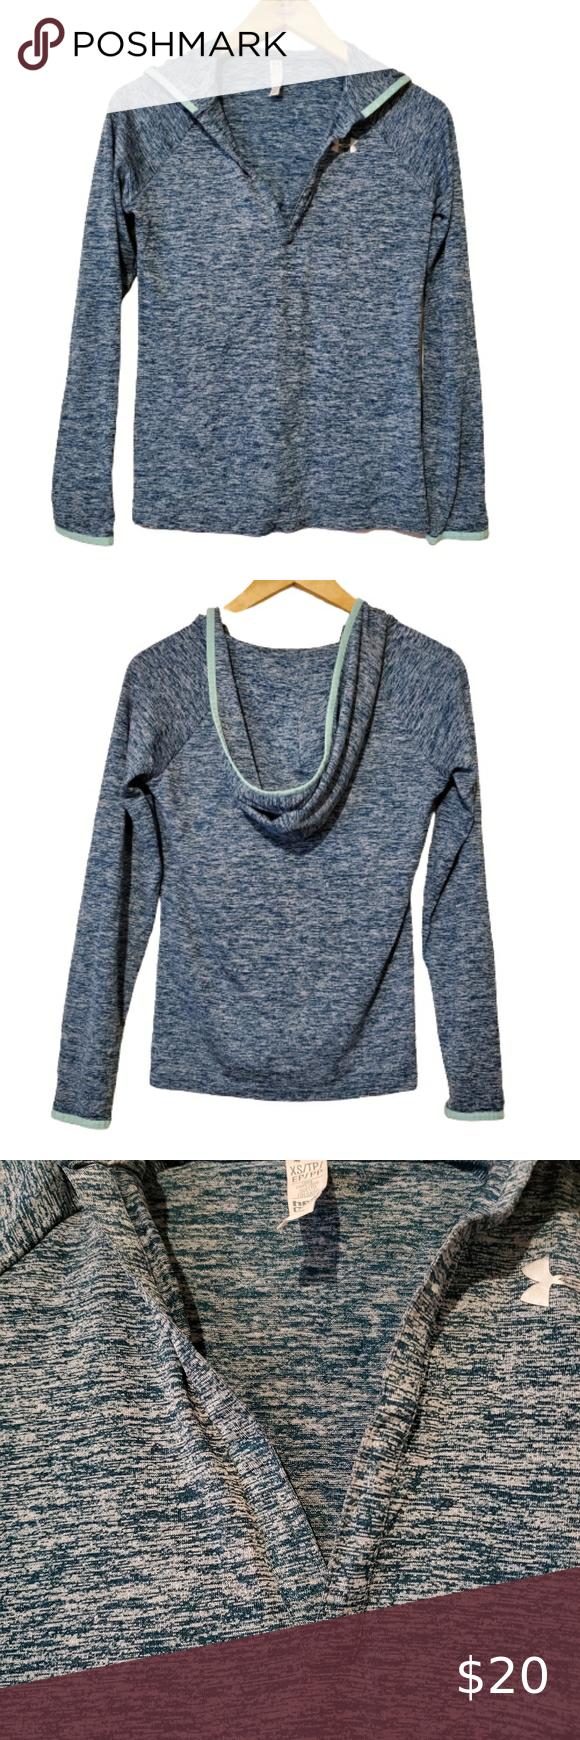 Directamente Estado Perceptivo  Under Armour Women's Tech Twist Sweater | Under armour women, Clothes  design, Sweaters